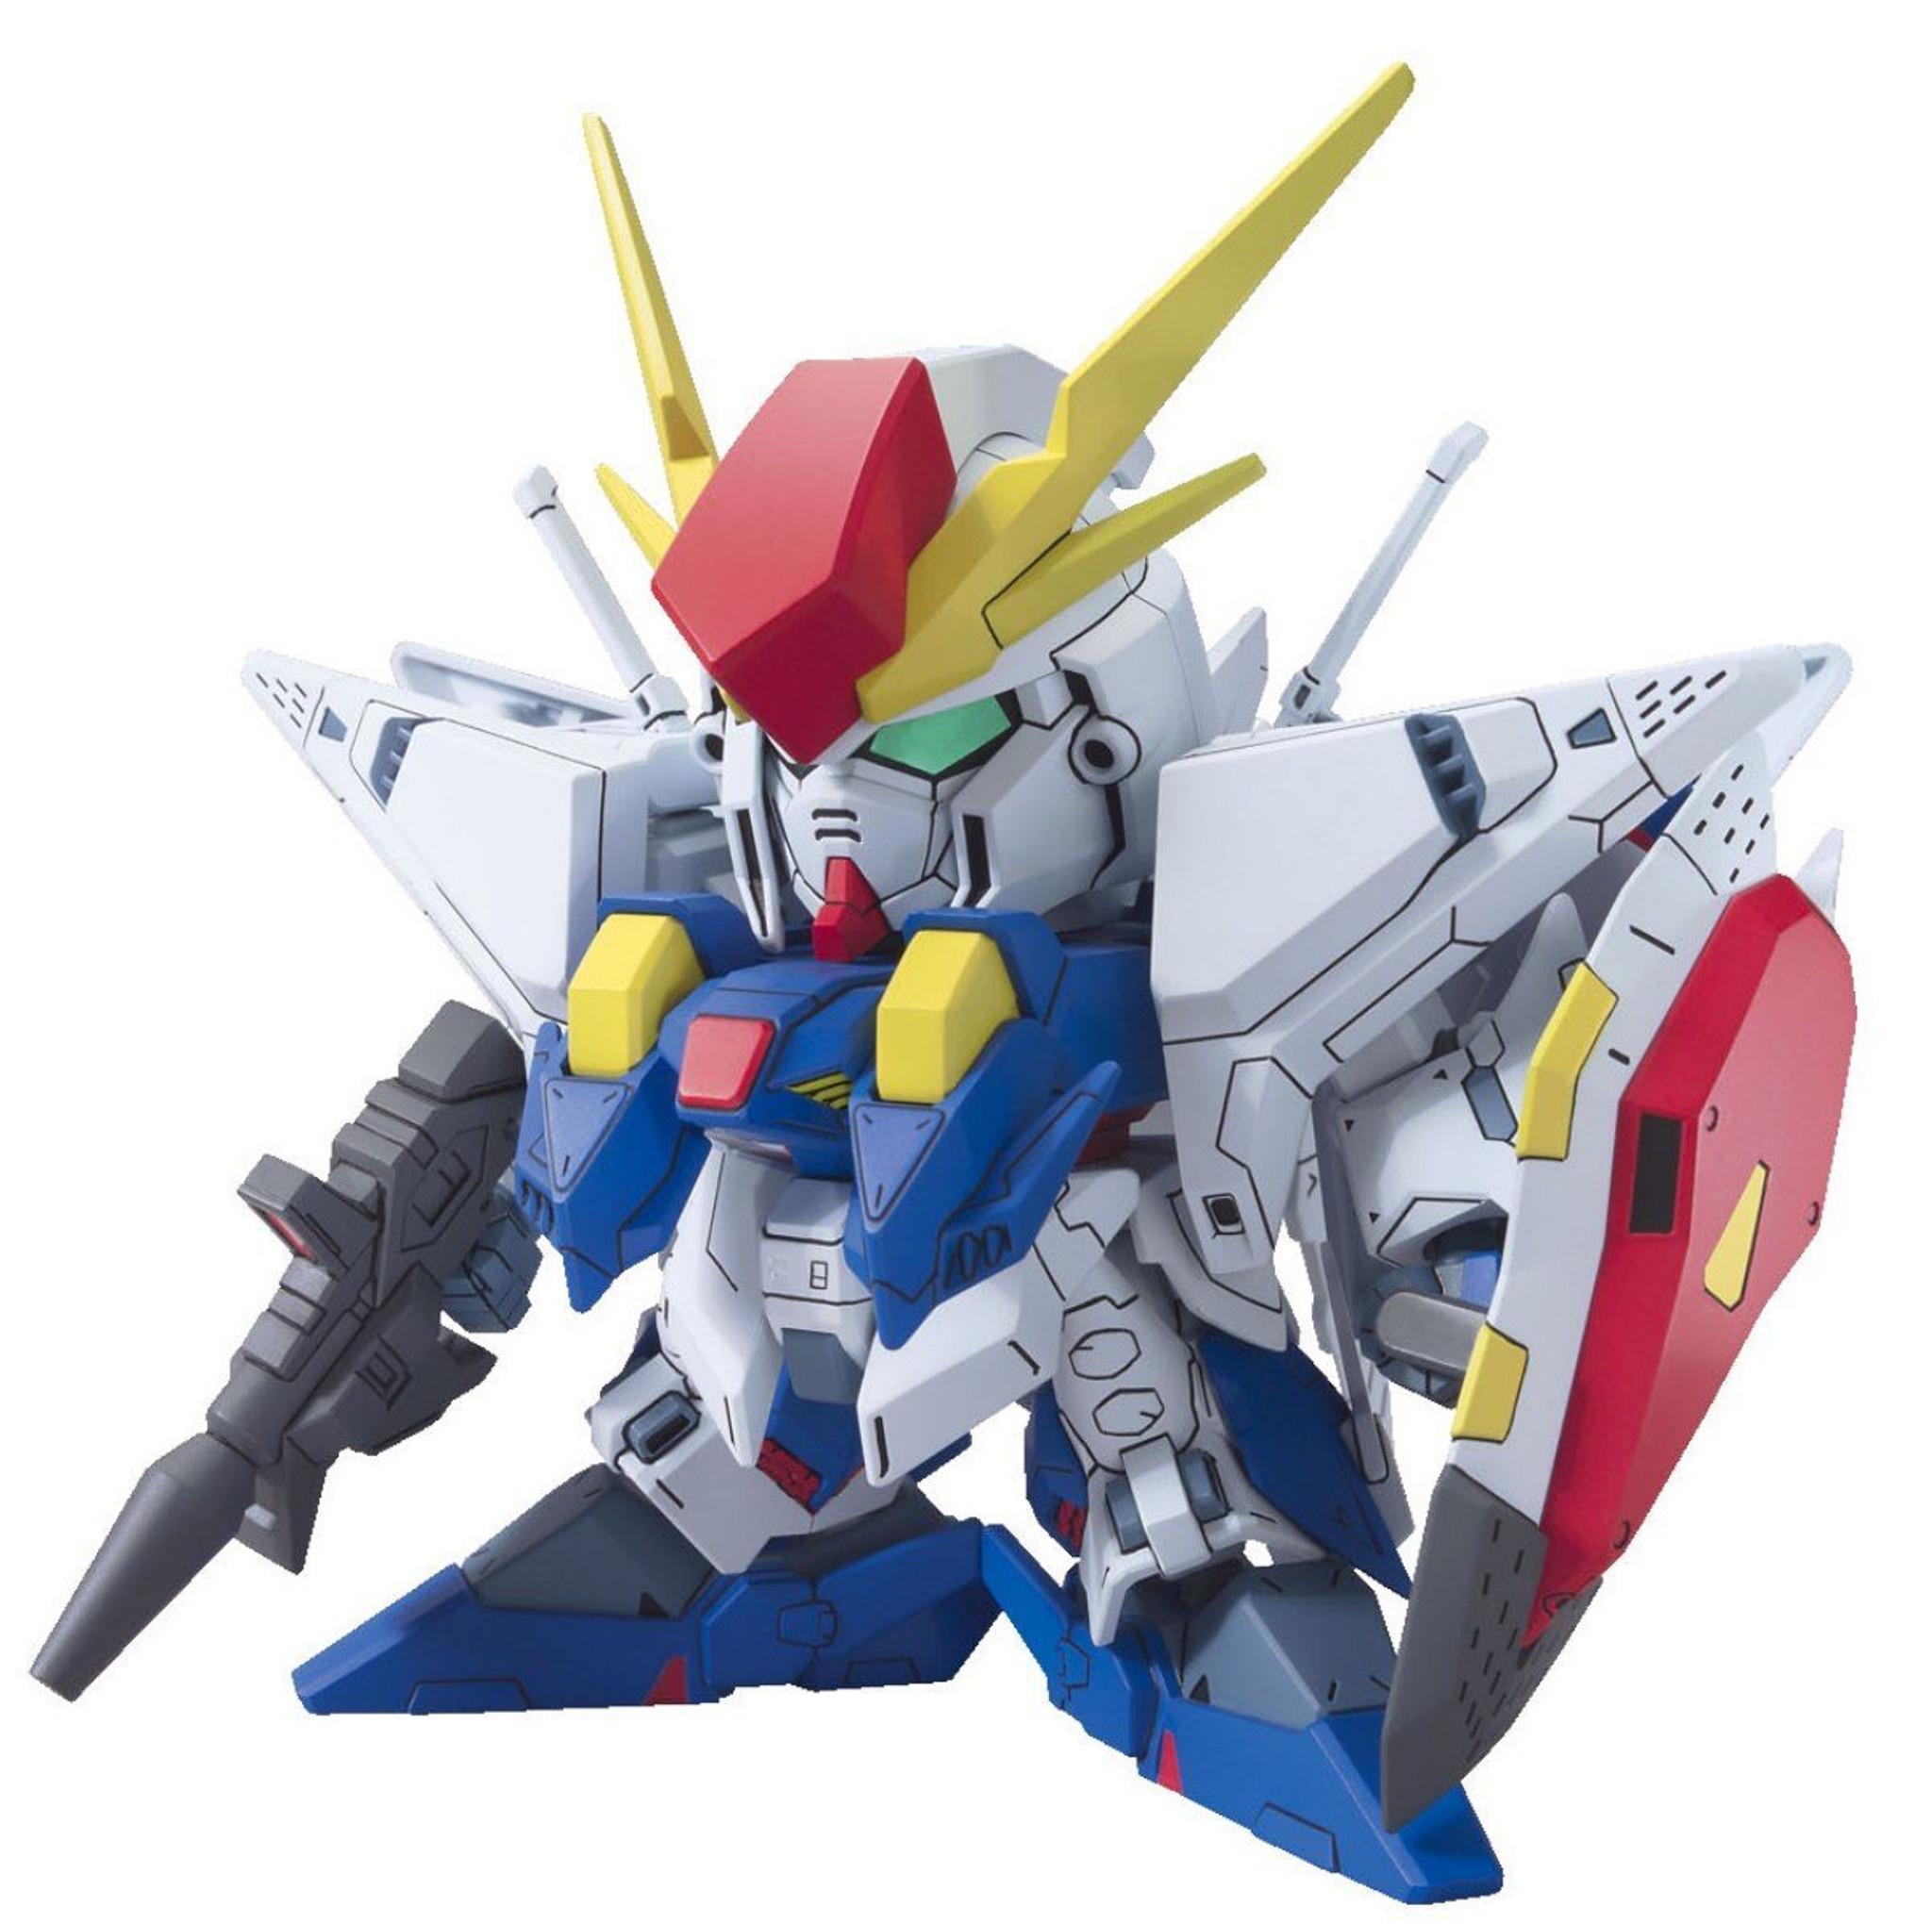 Bandai Sd Bb 386 Gundam Rx 105 Xi Plazajapan Original Model Kits V Plastic Kit